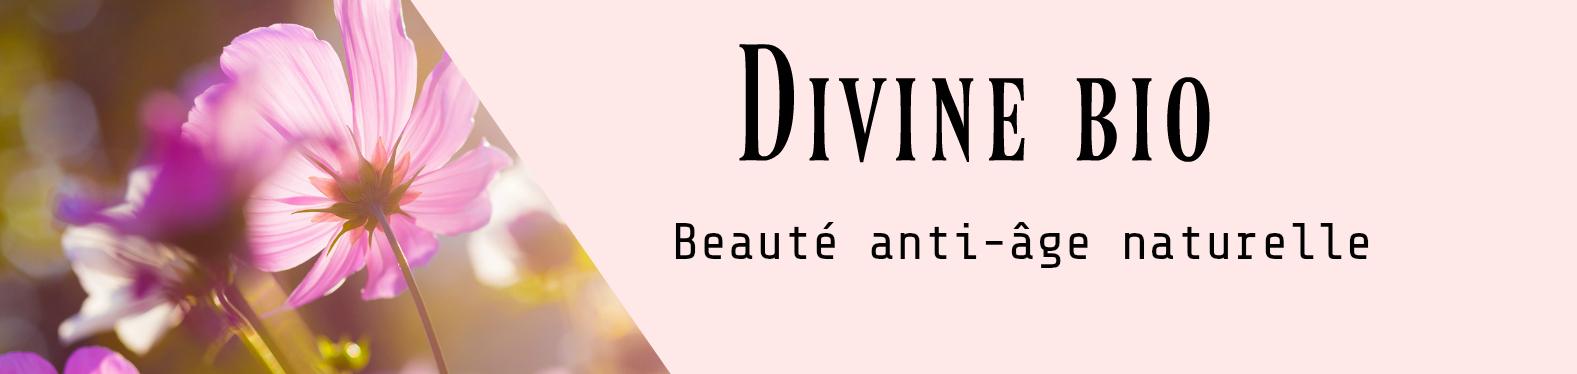 Divine bio